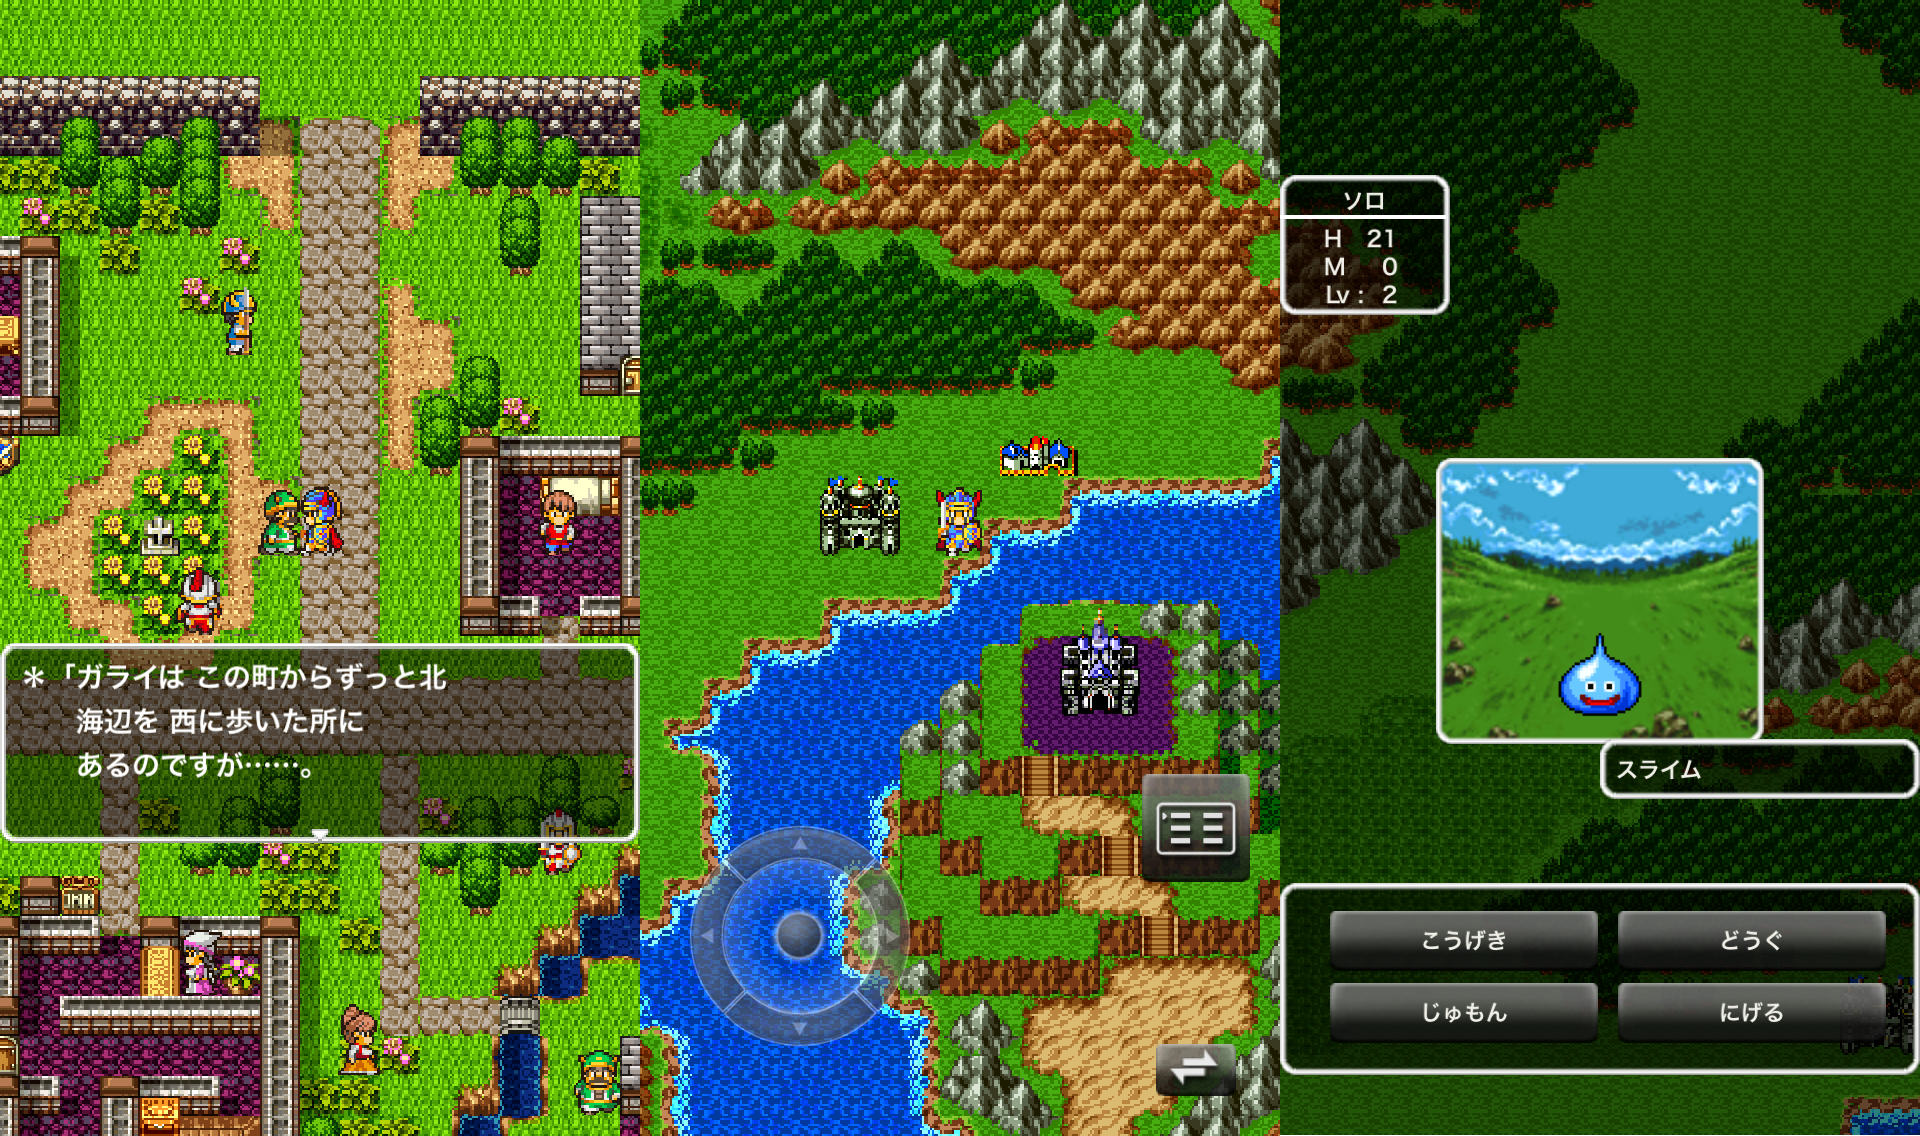 Modojo | Dragon Quest Tips and Tricks